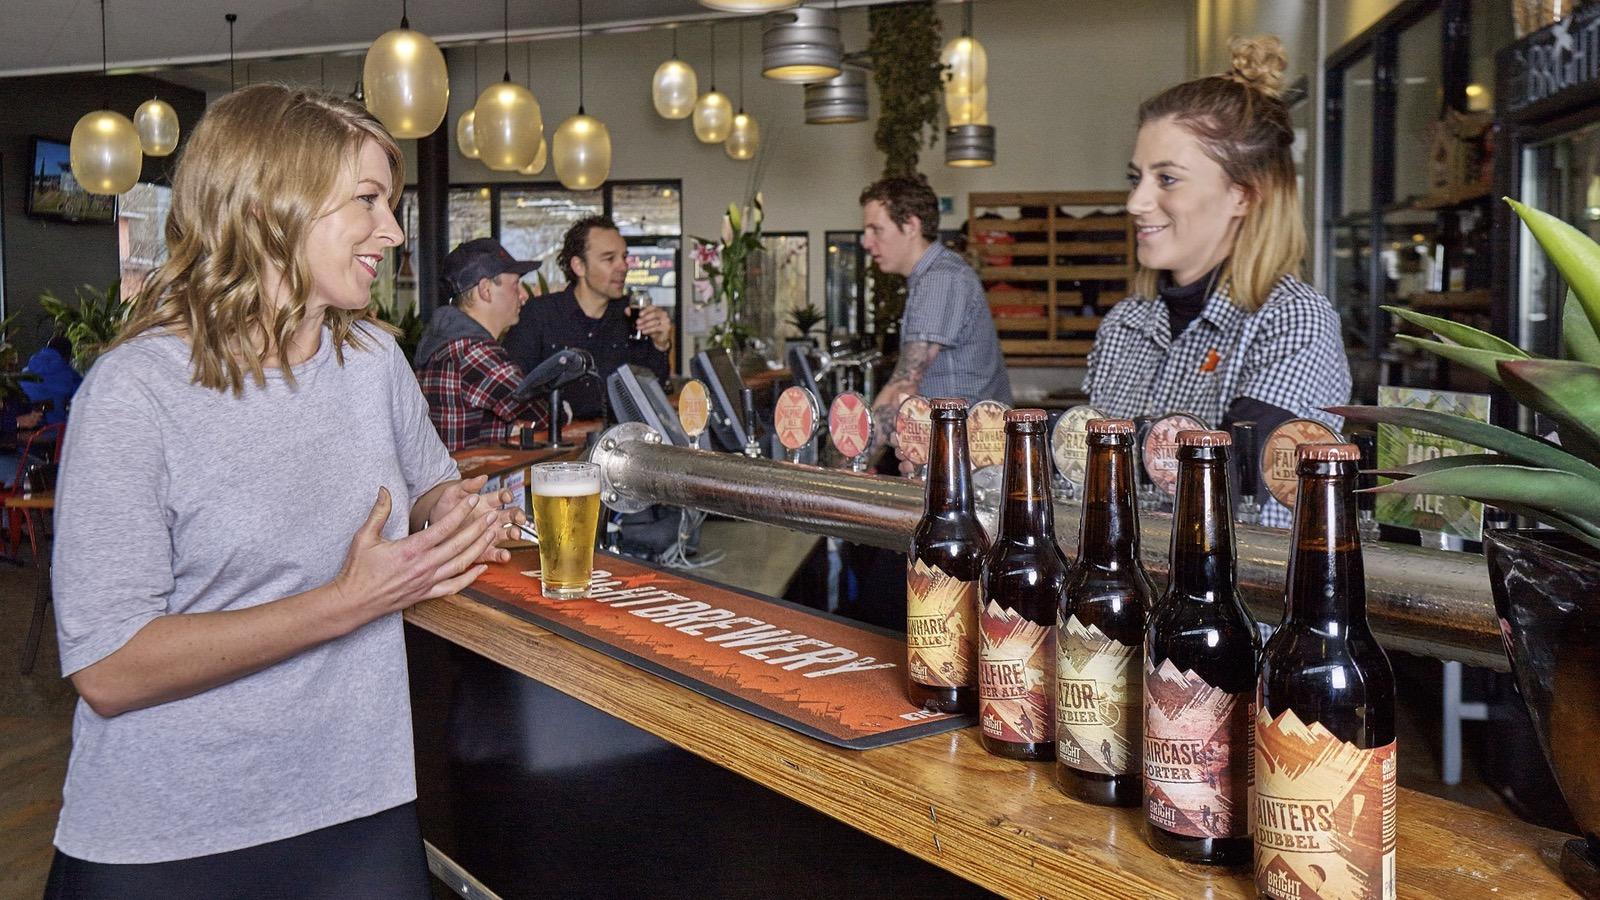 Customers ordering beer at Bright Brewery's bar